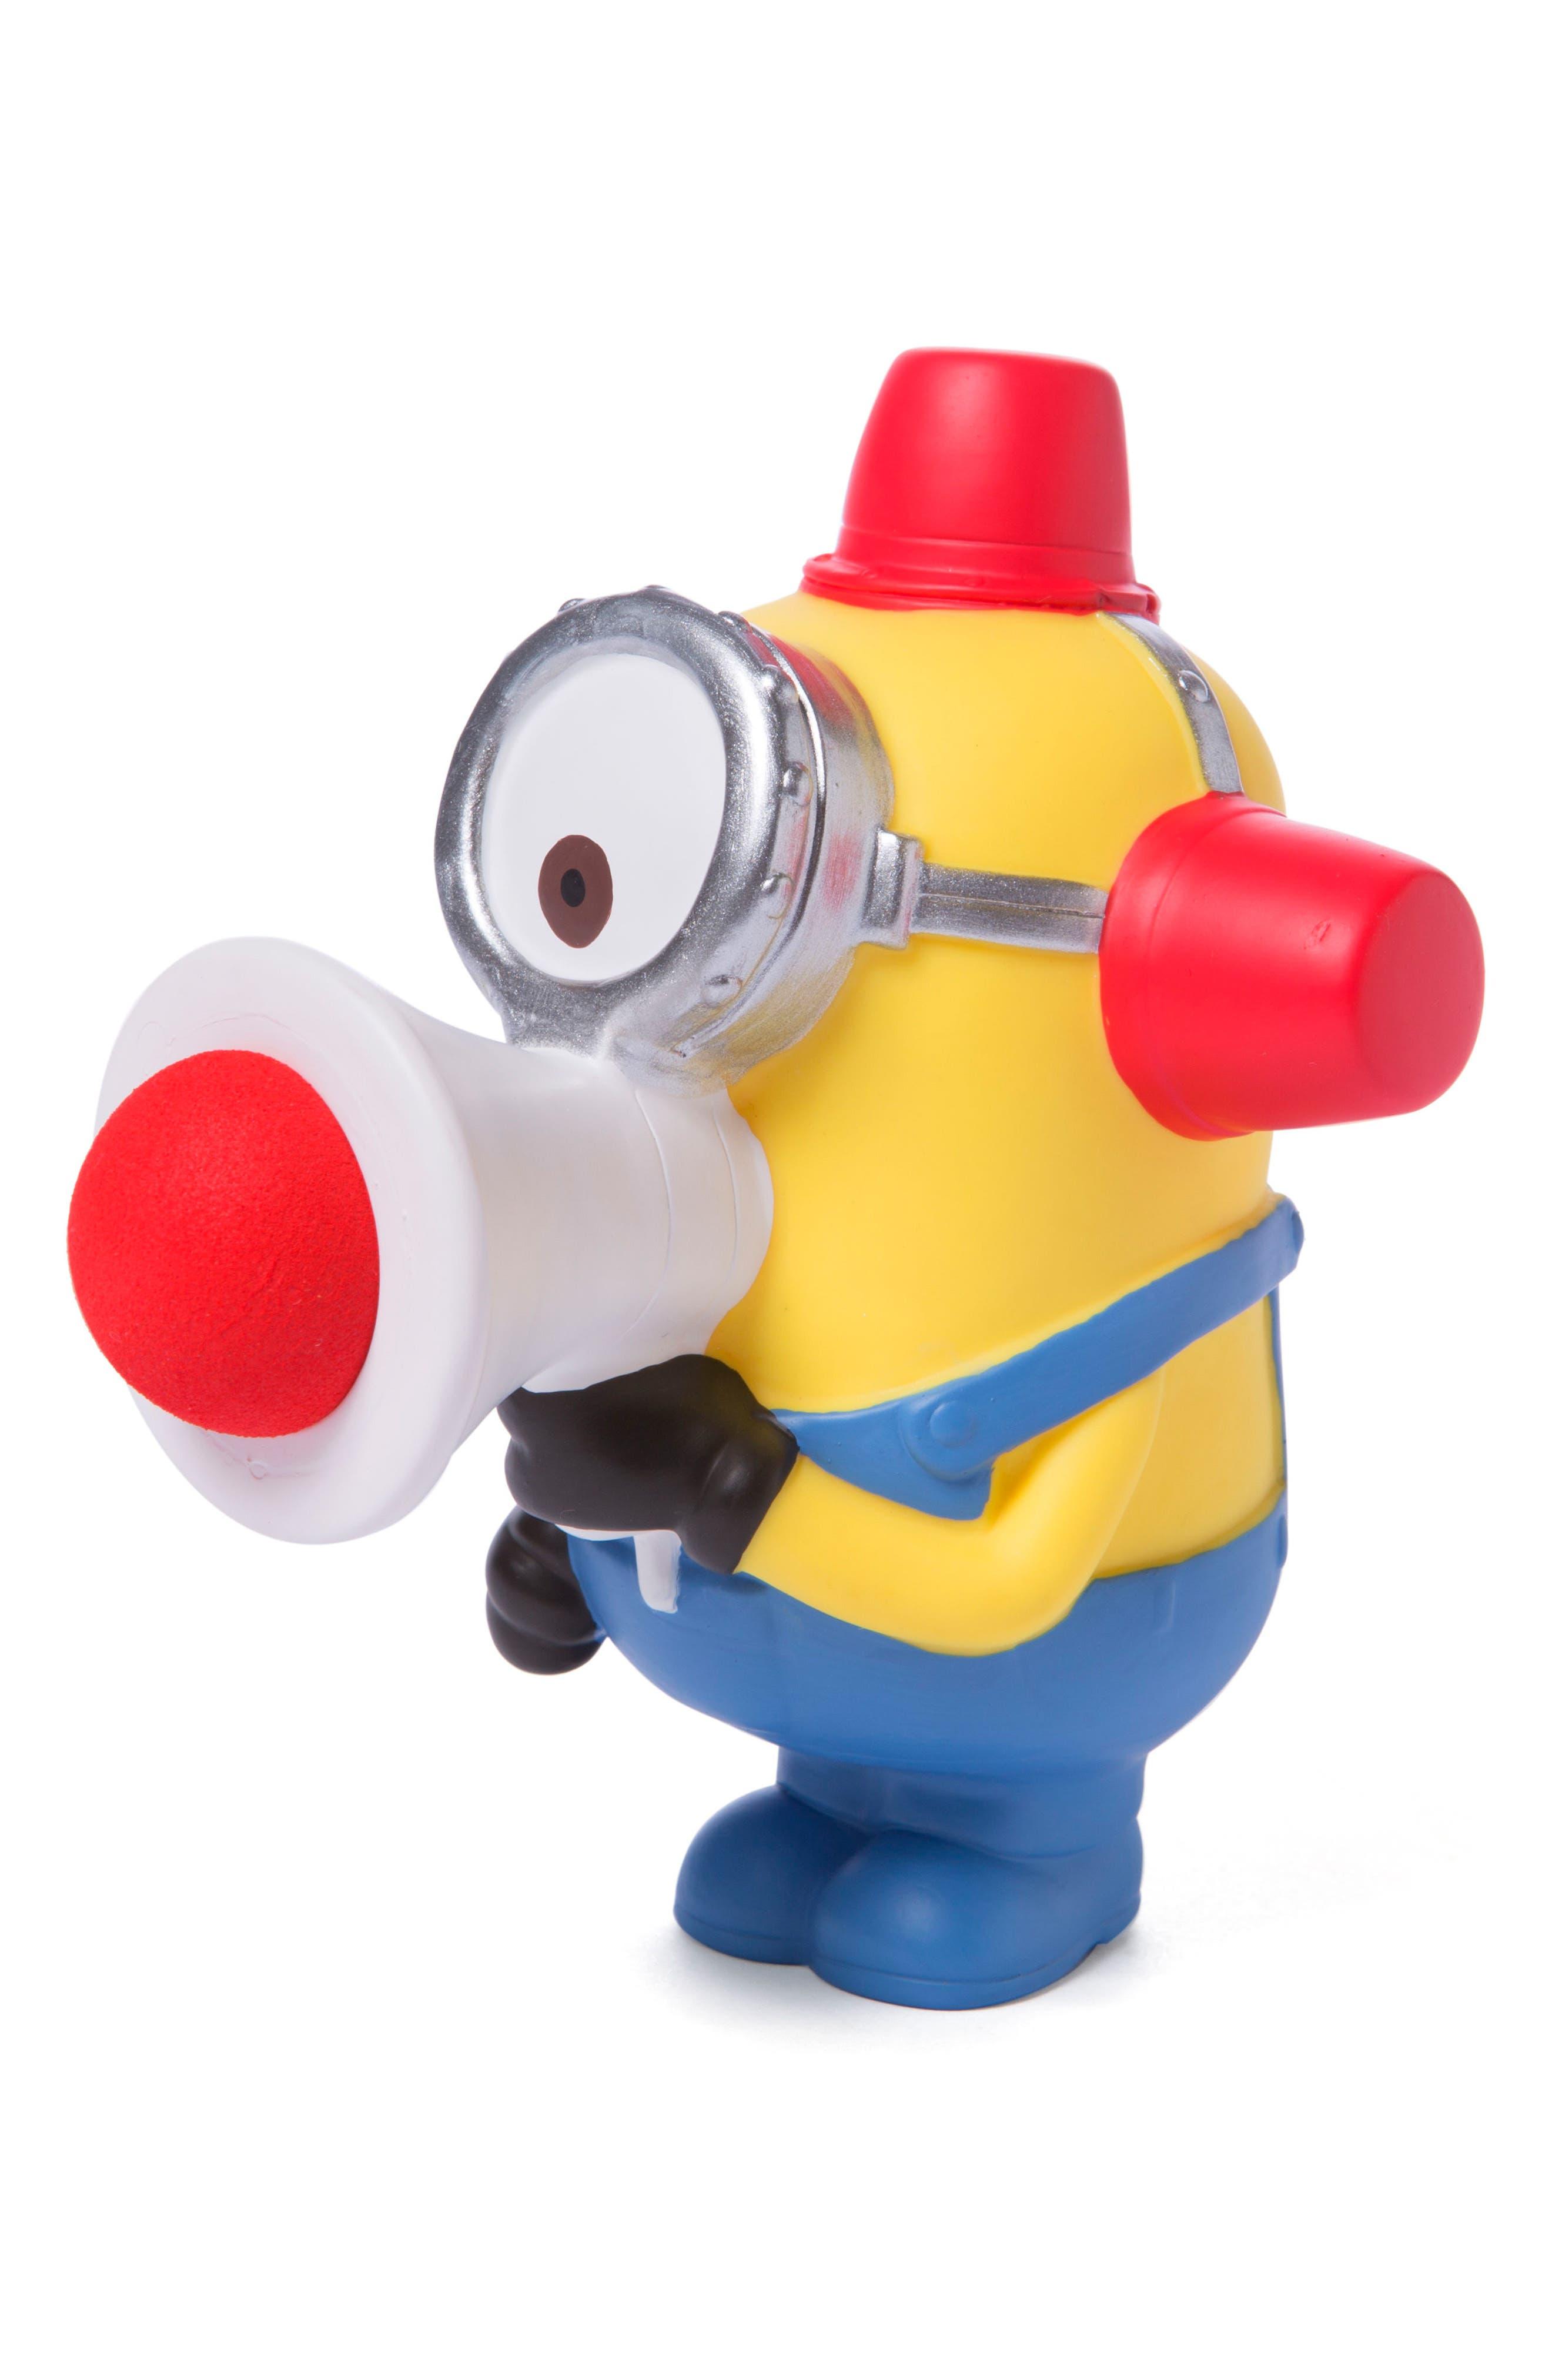 Carl Minion Popper Toy,                             Main thumbnail 1, color,                             700